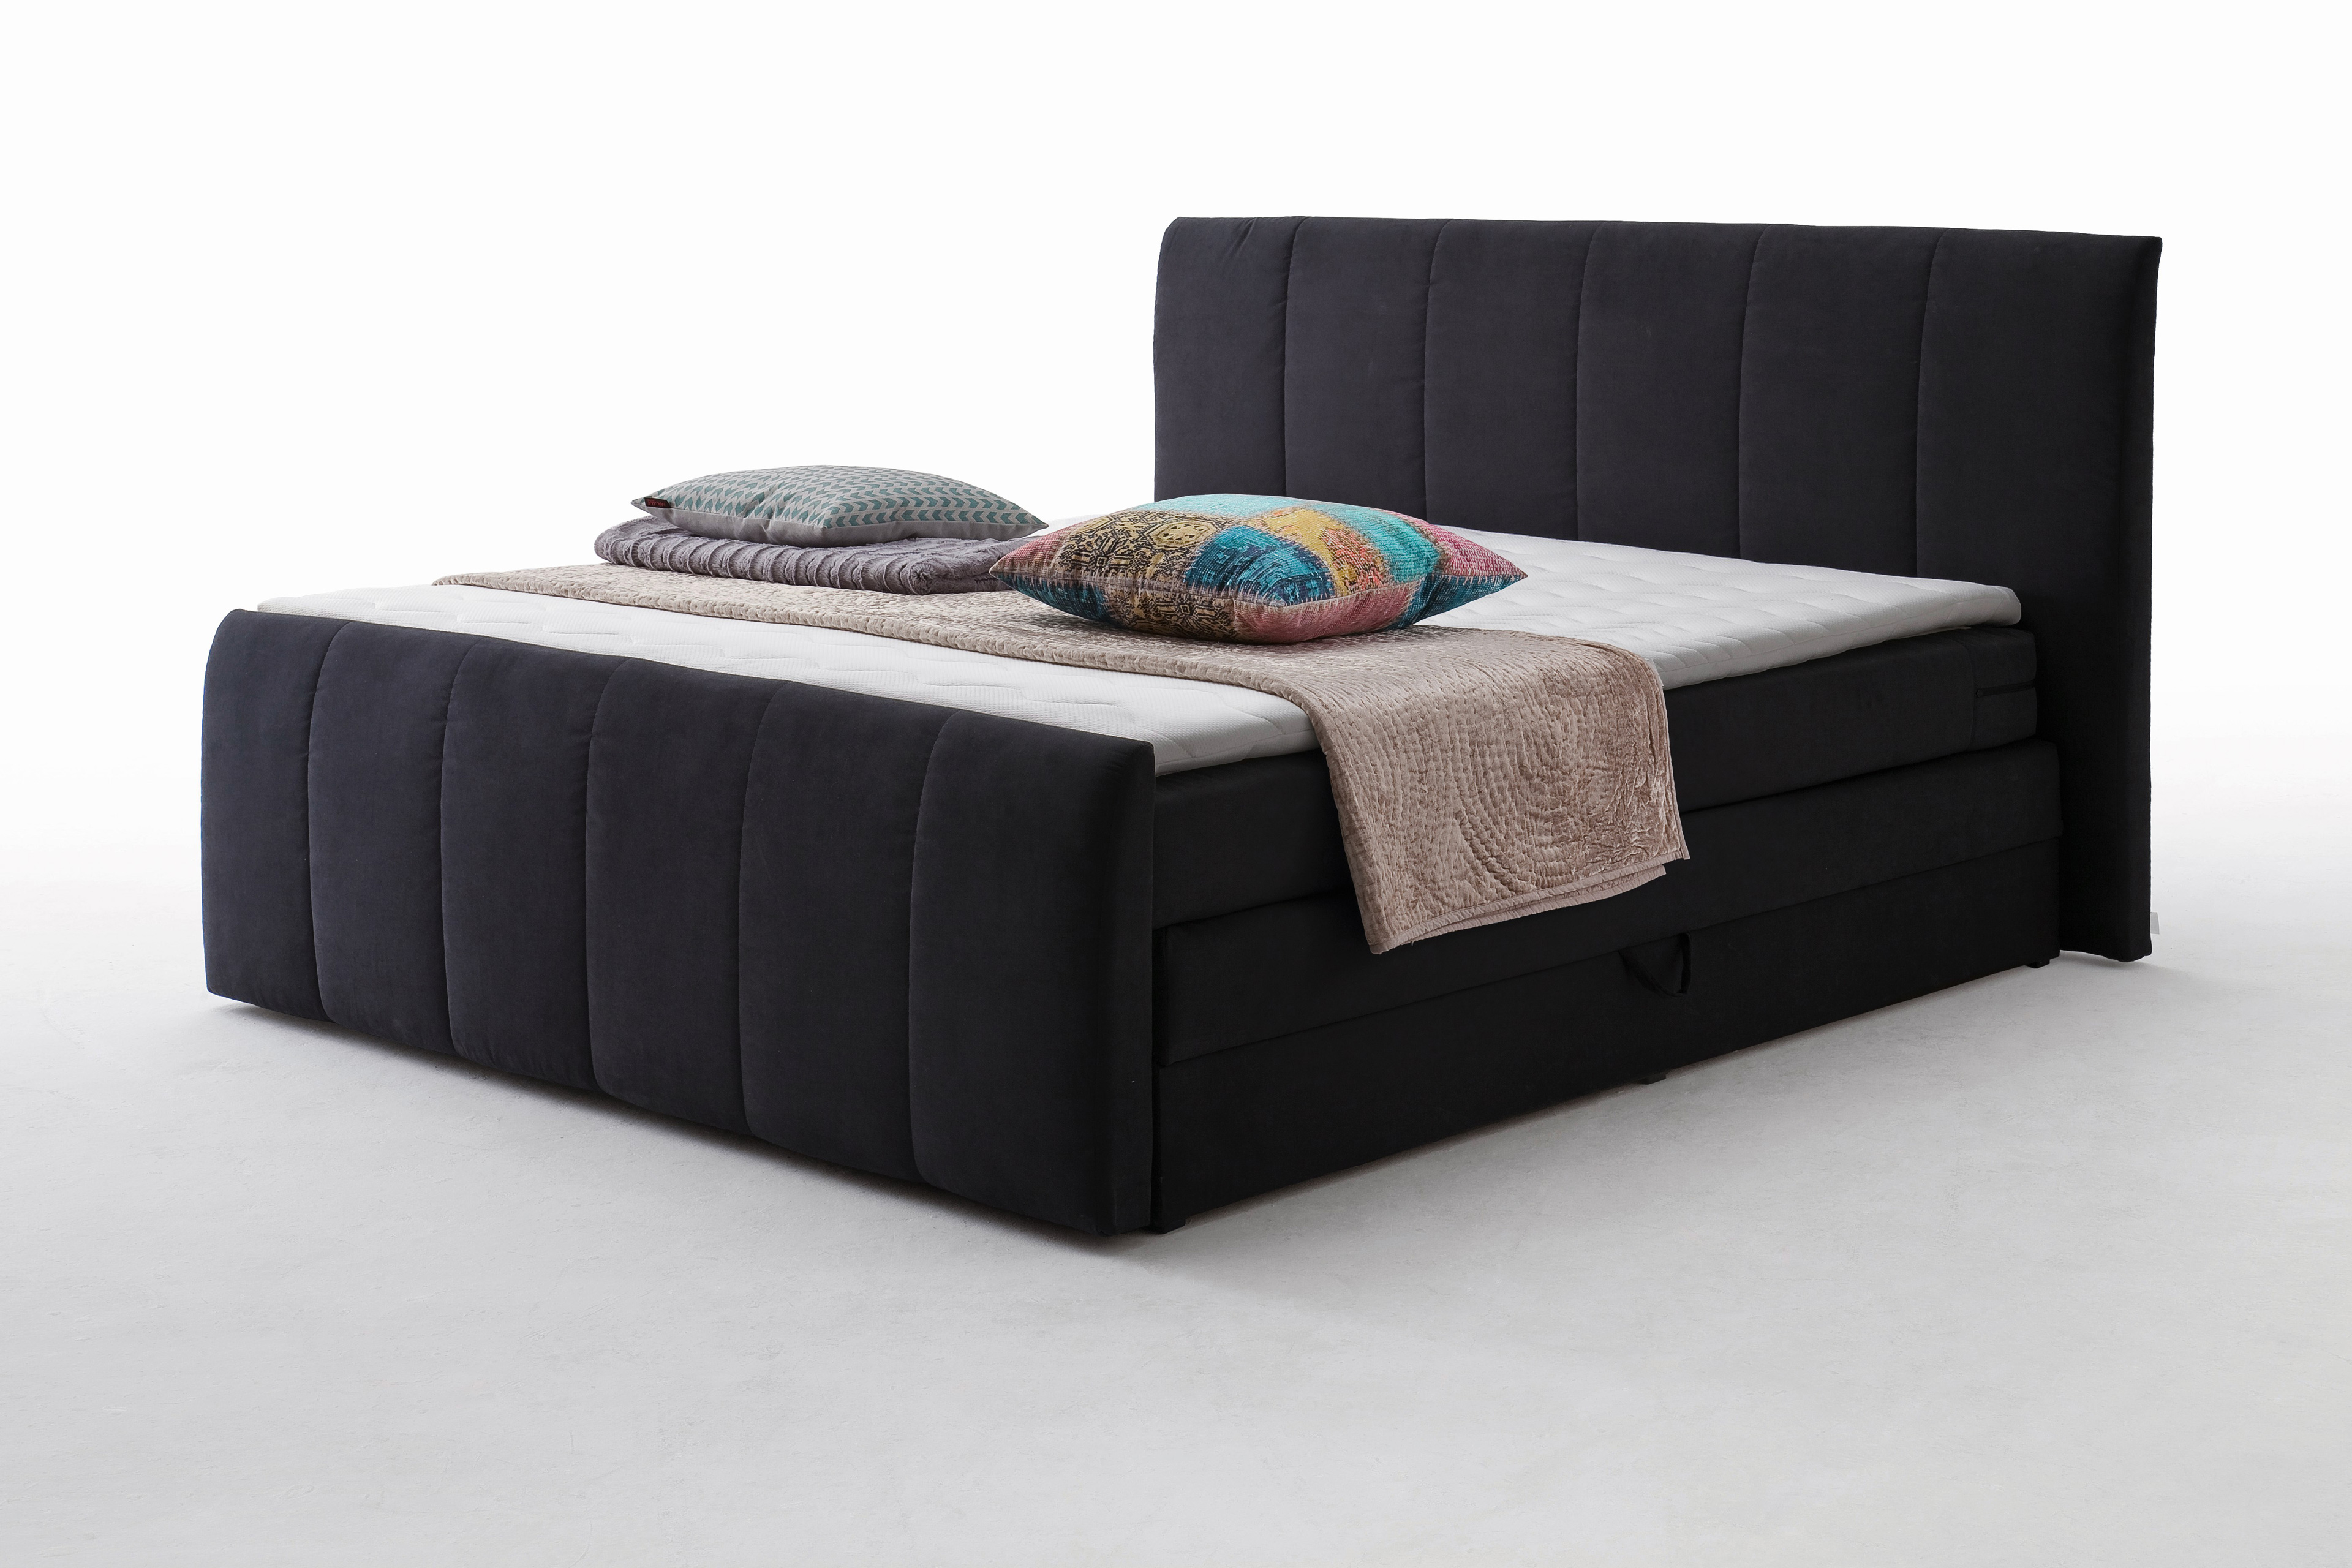 scheibengardinen modern k che tags scheibengardinen modern k che ikea sp lschrank varde. Black Bedroom Furniture Sets. Home Design Ideas